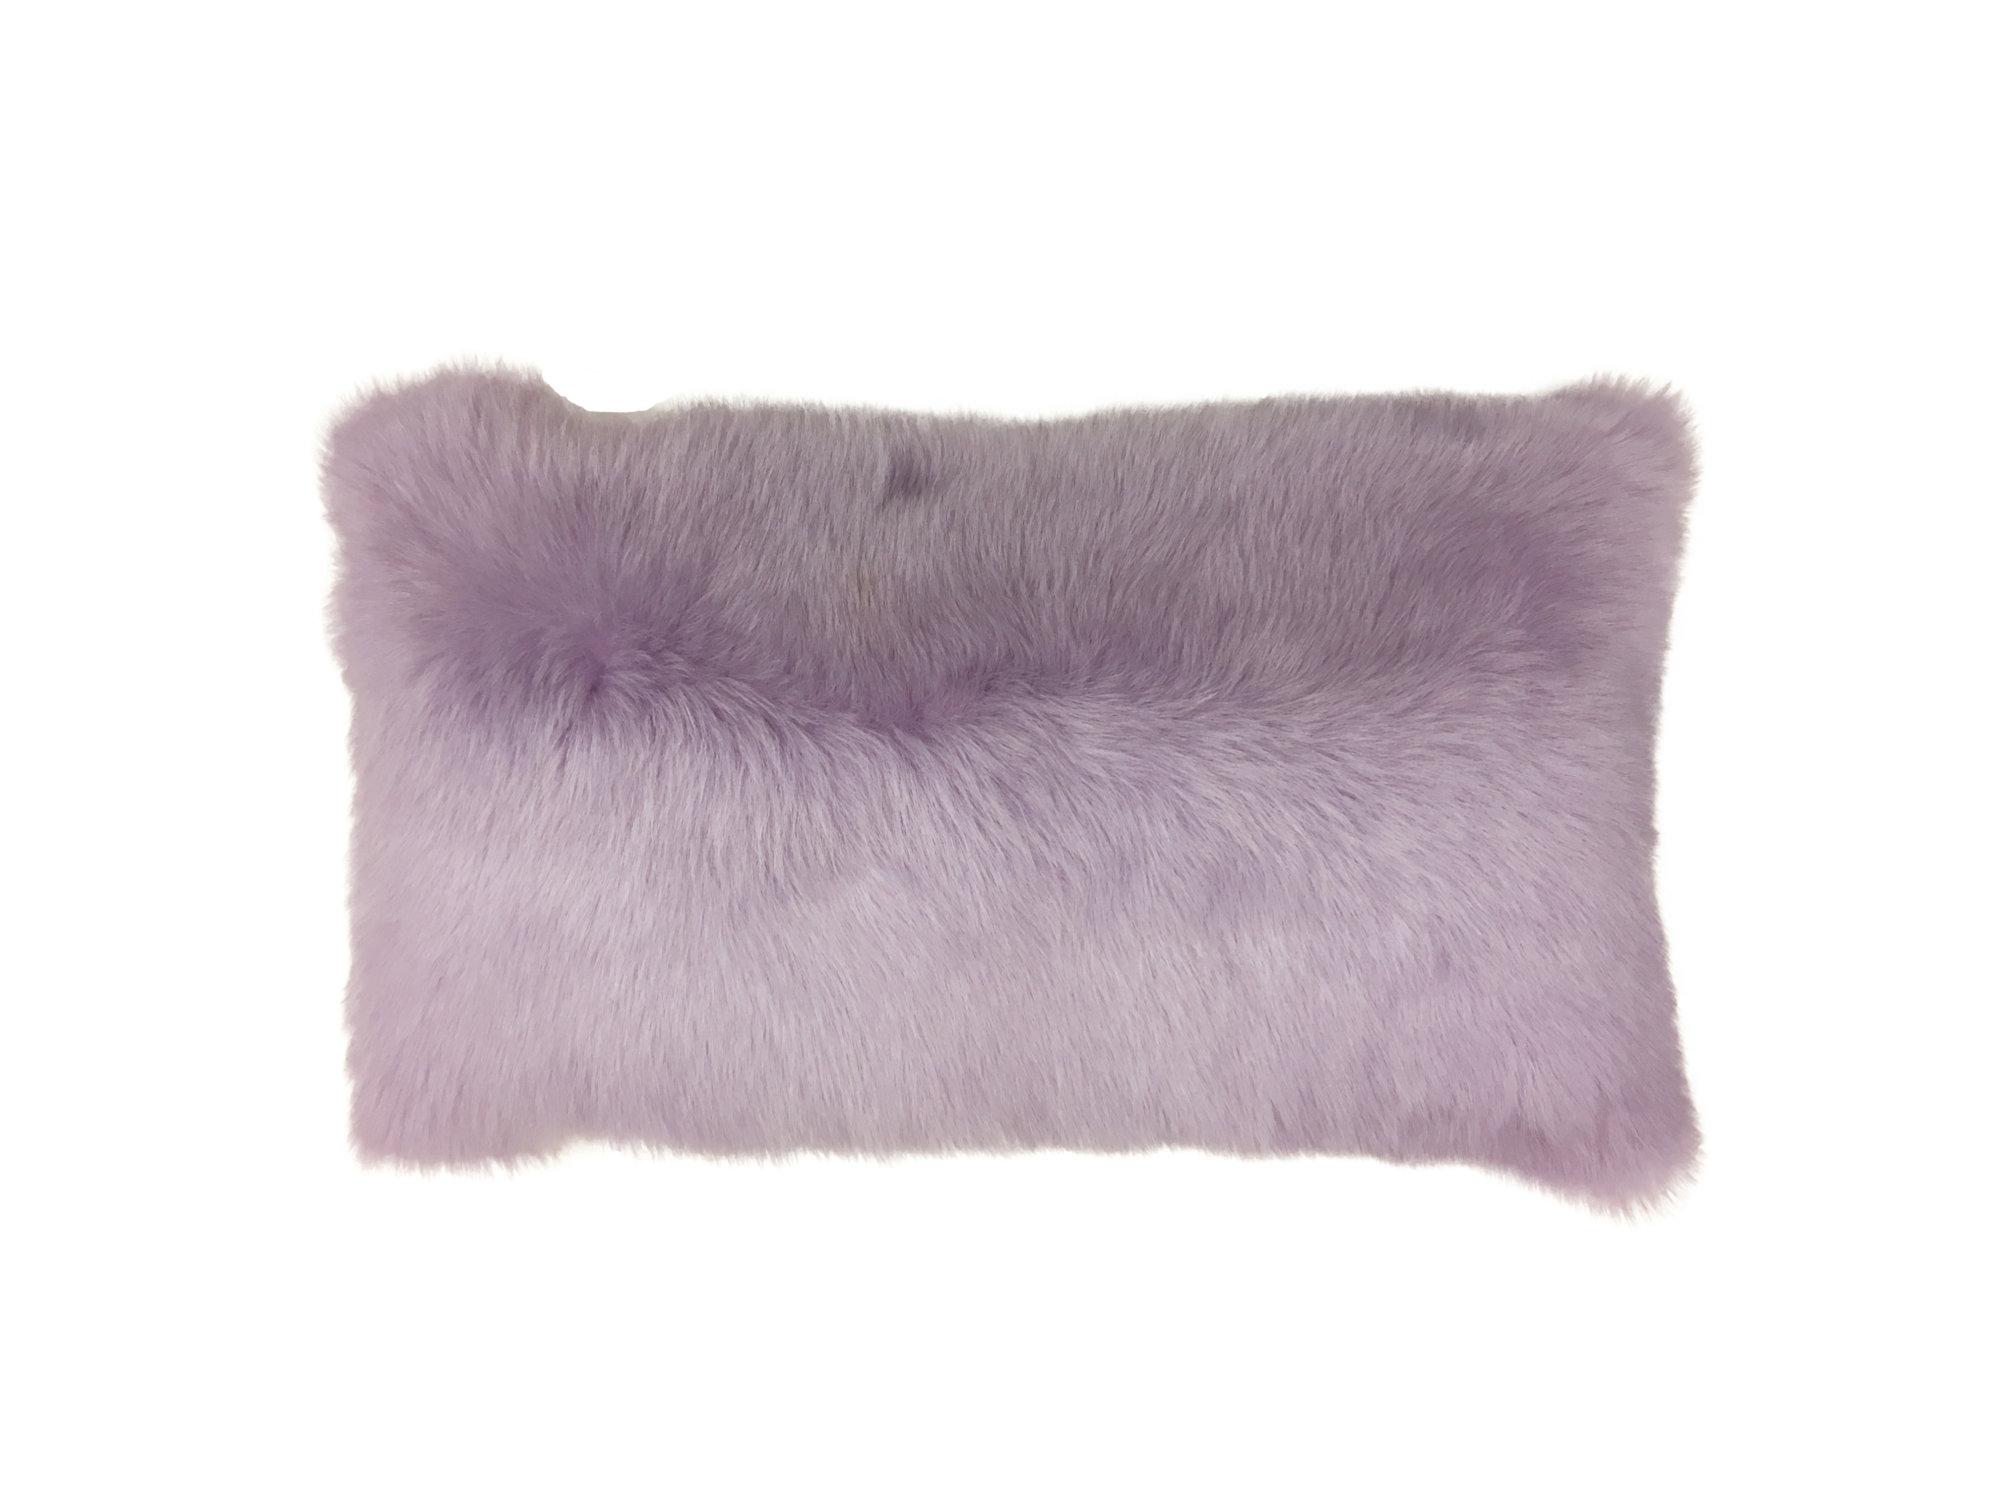 Shearling Pillow-Lilla-30x50cm-SPLILS2543050 - ANVOGG FEEL SHEARLING | ANVOGG